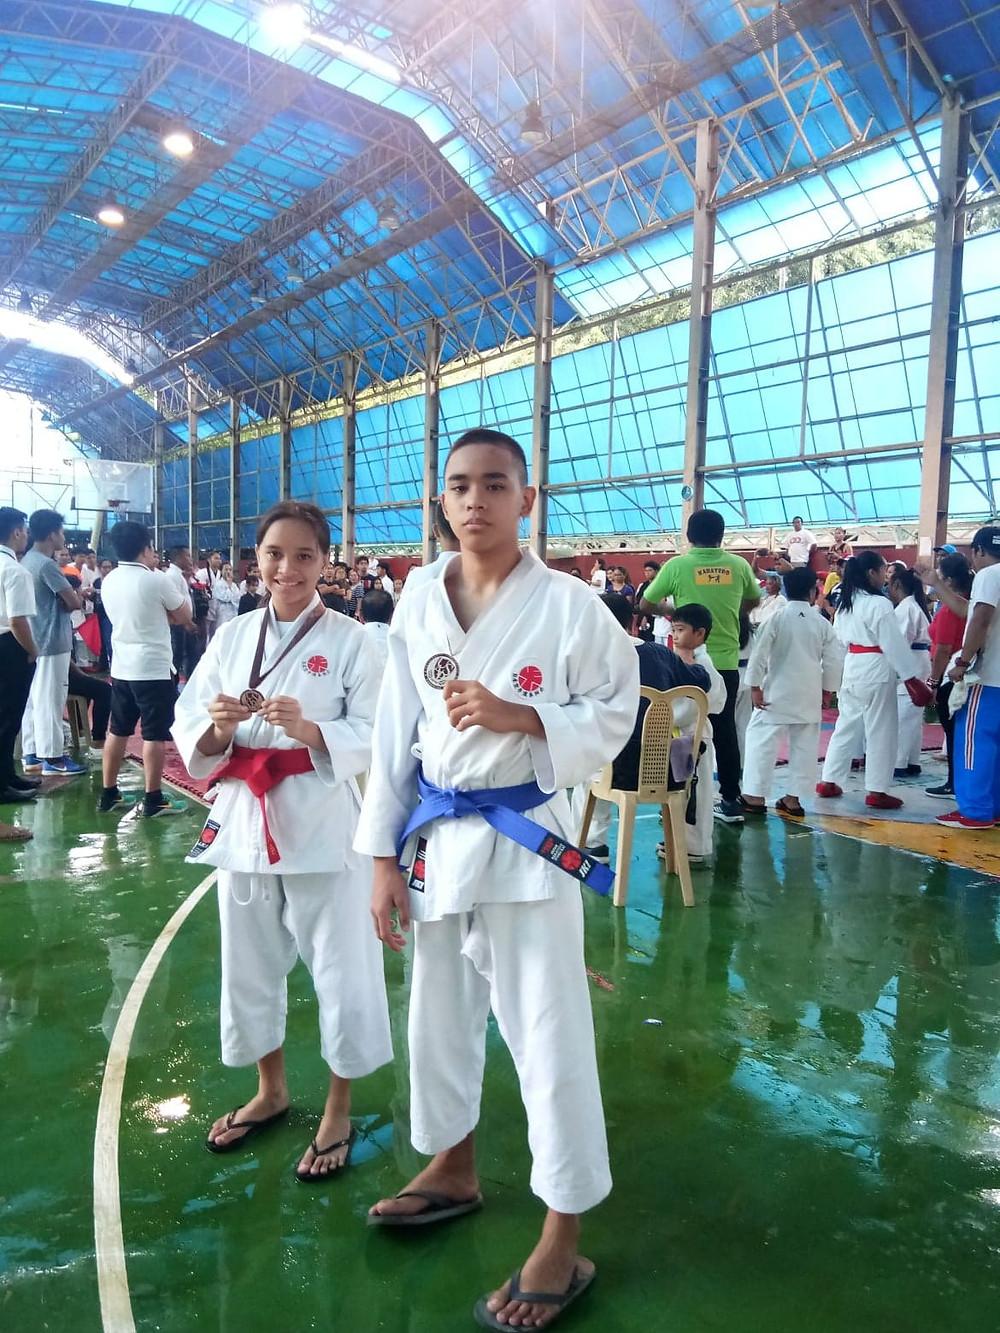 Itosu-kai Philippines in Championships